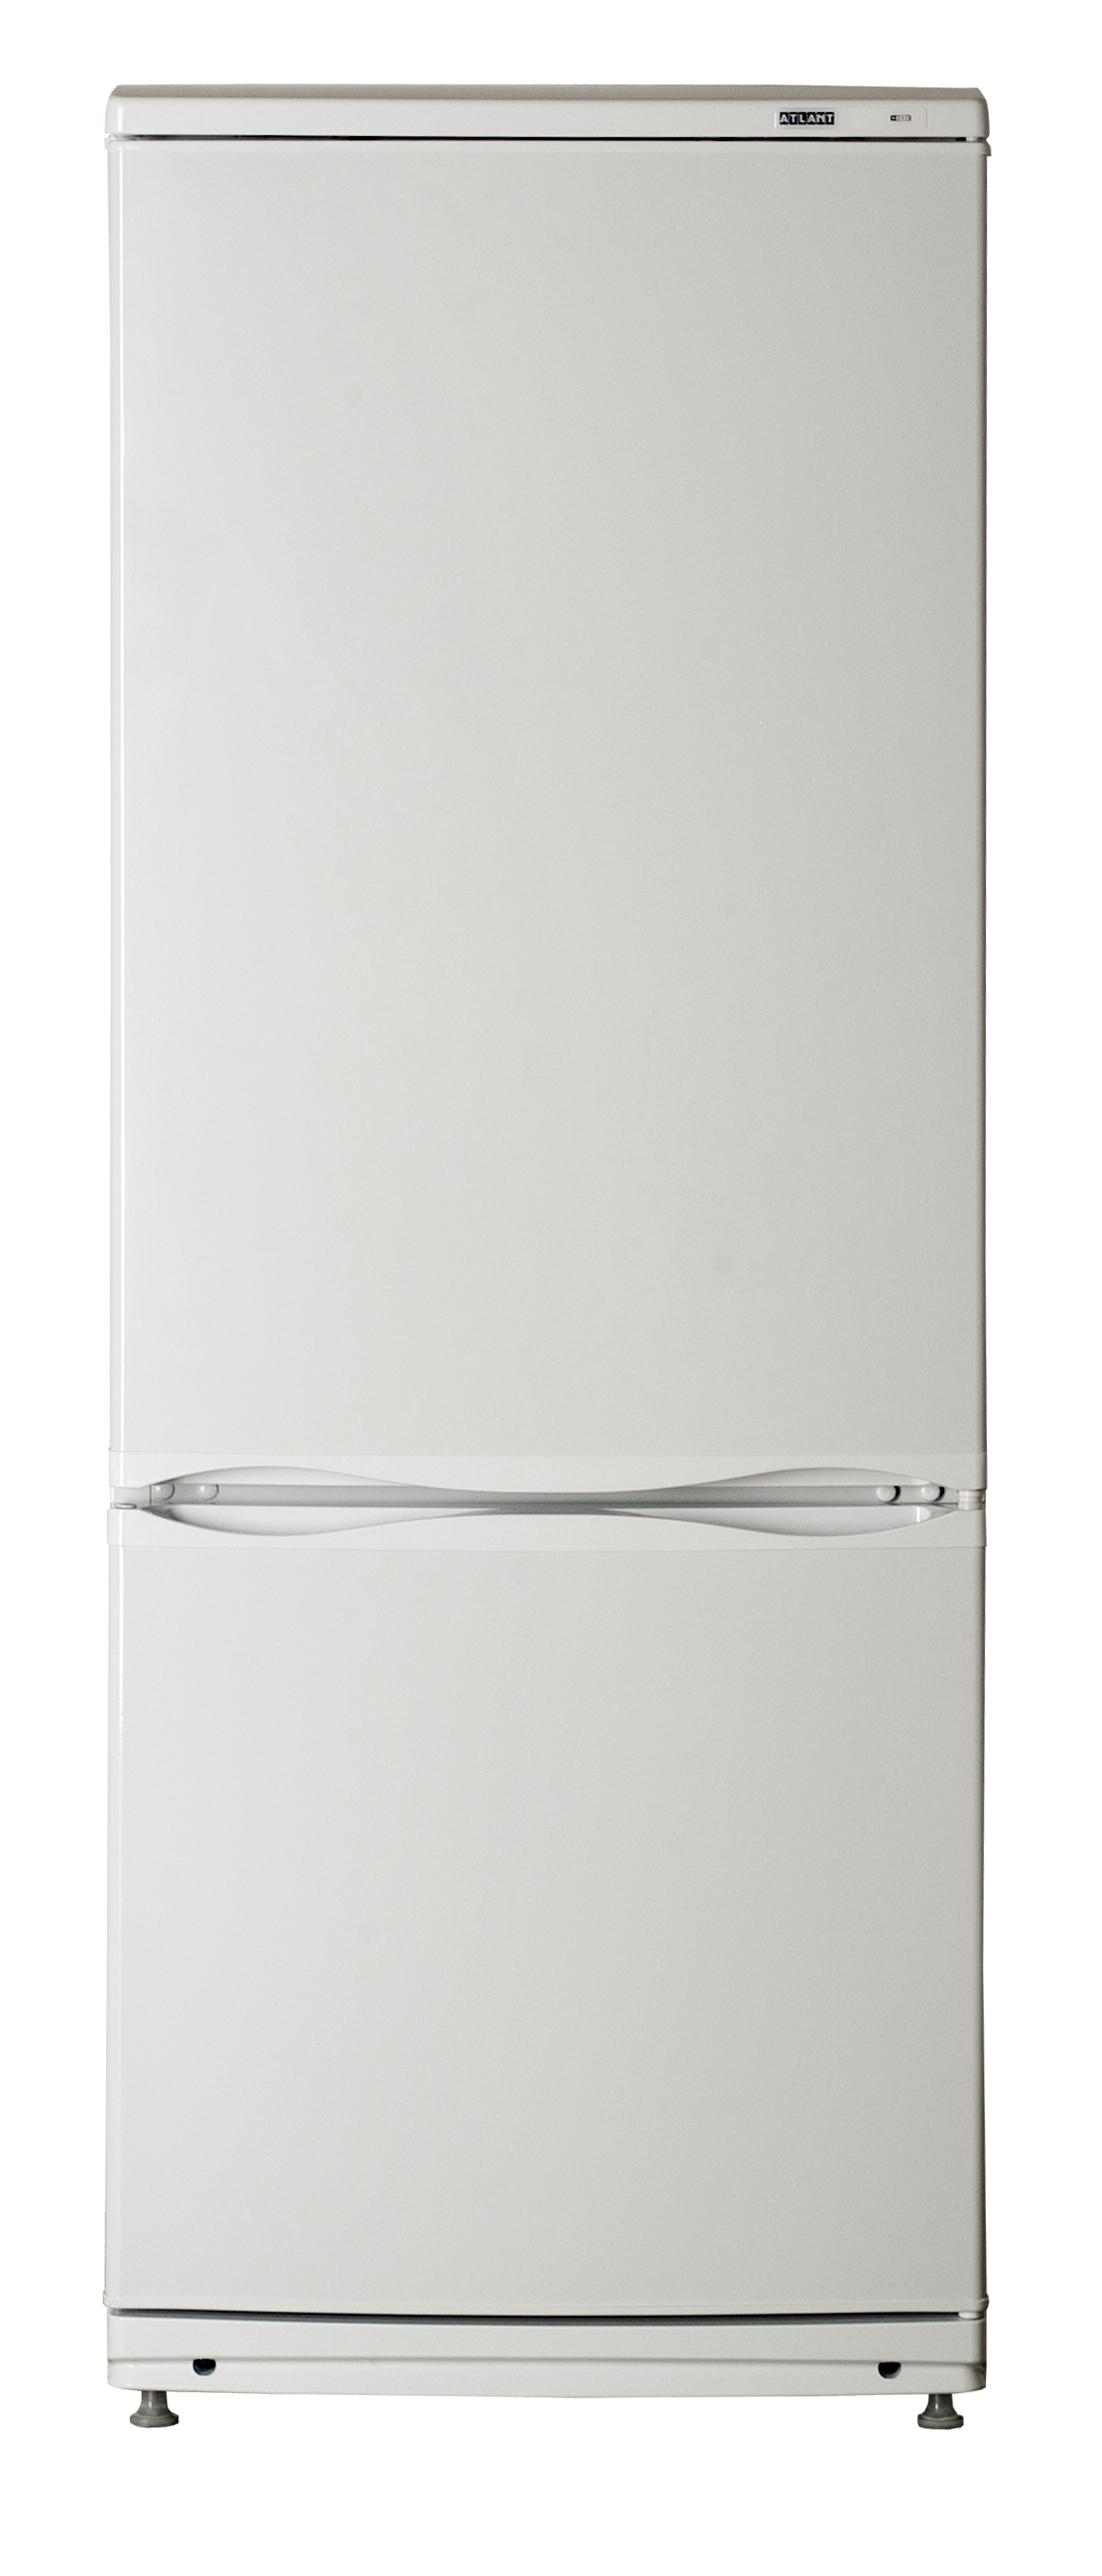 Холодильник Атлант Real Brand Technics 12440.000